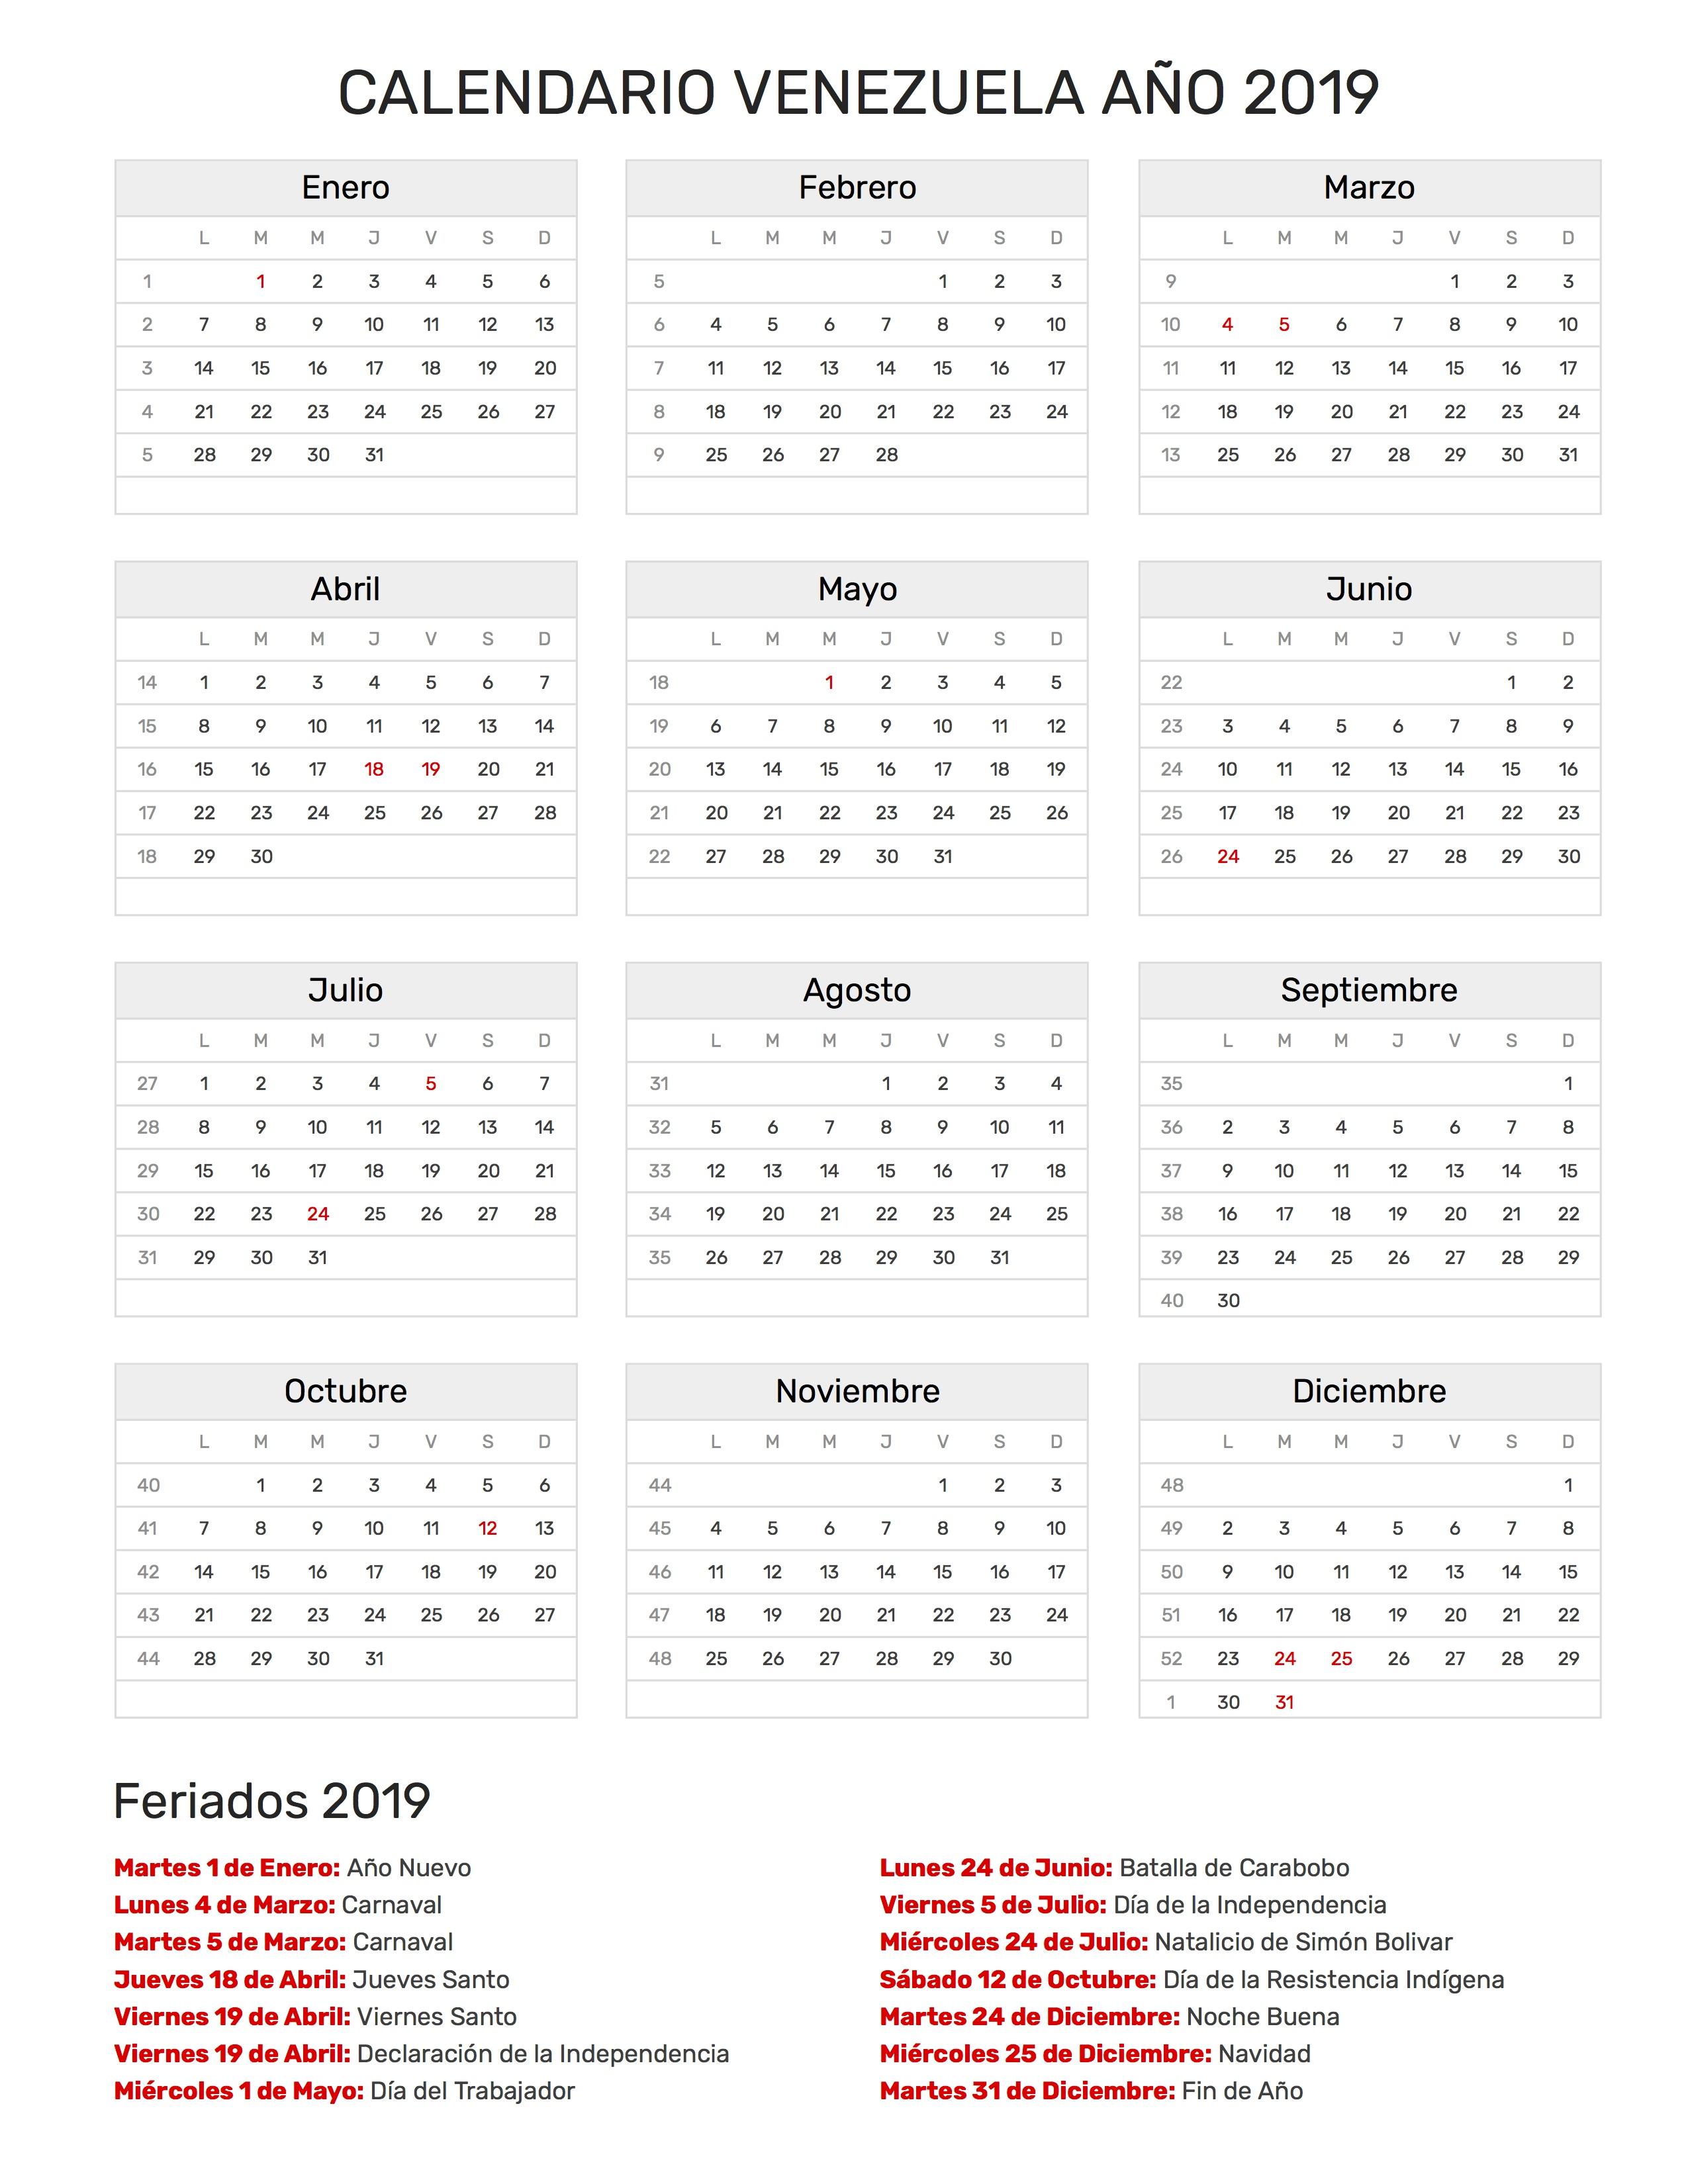 Calendario Imbottigliamento 2020.Calendario Del 2020 Venezuela